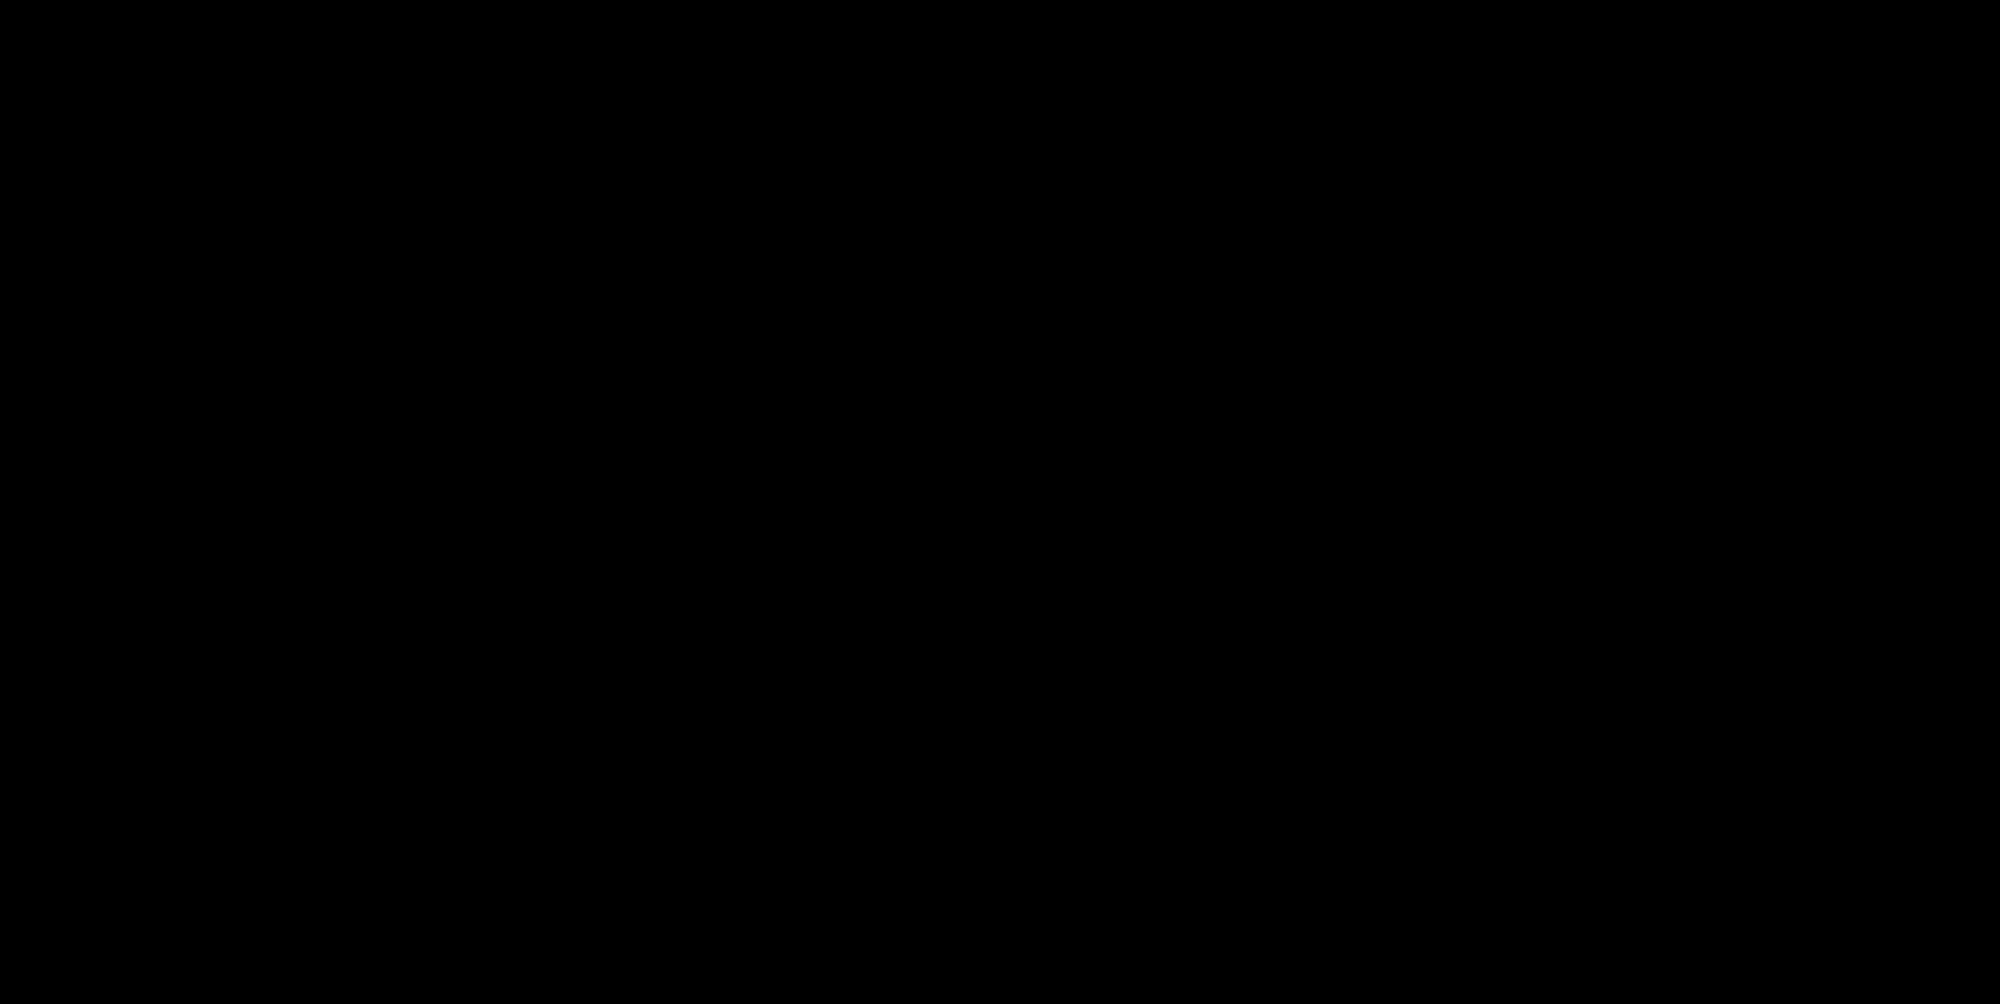 2000x1004 Filewikiotter.svg